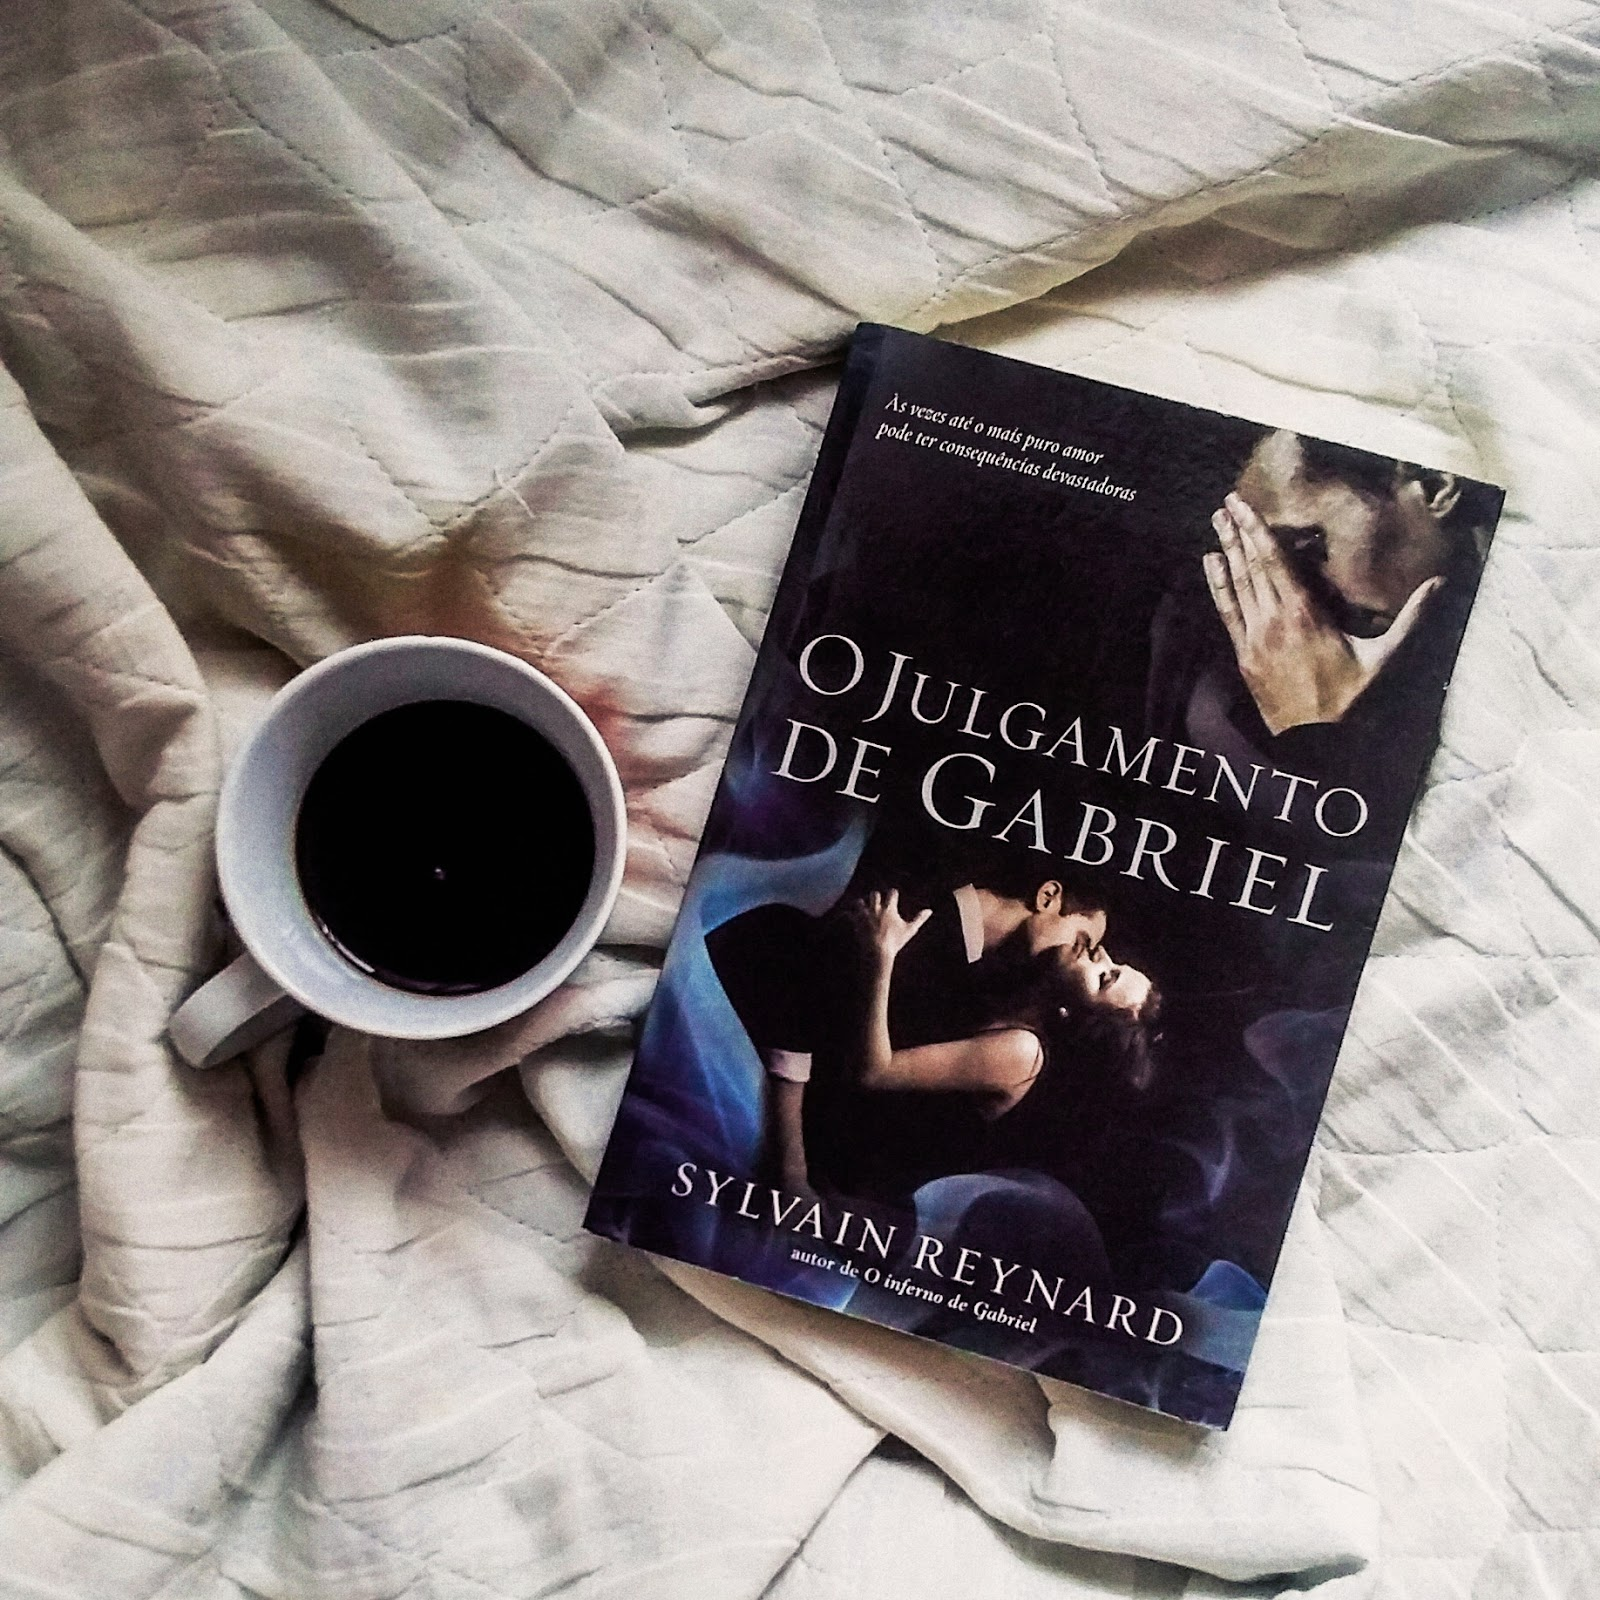 O JULGAMENTO DE GABRIEL #2 - SYLVAIN REYNARD | BLOG CONFIDENT POR LETÍCIA CAETANO